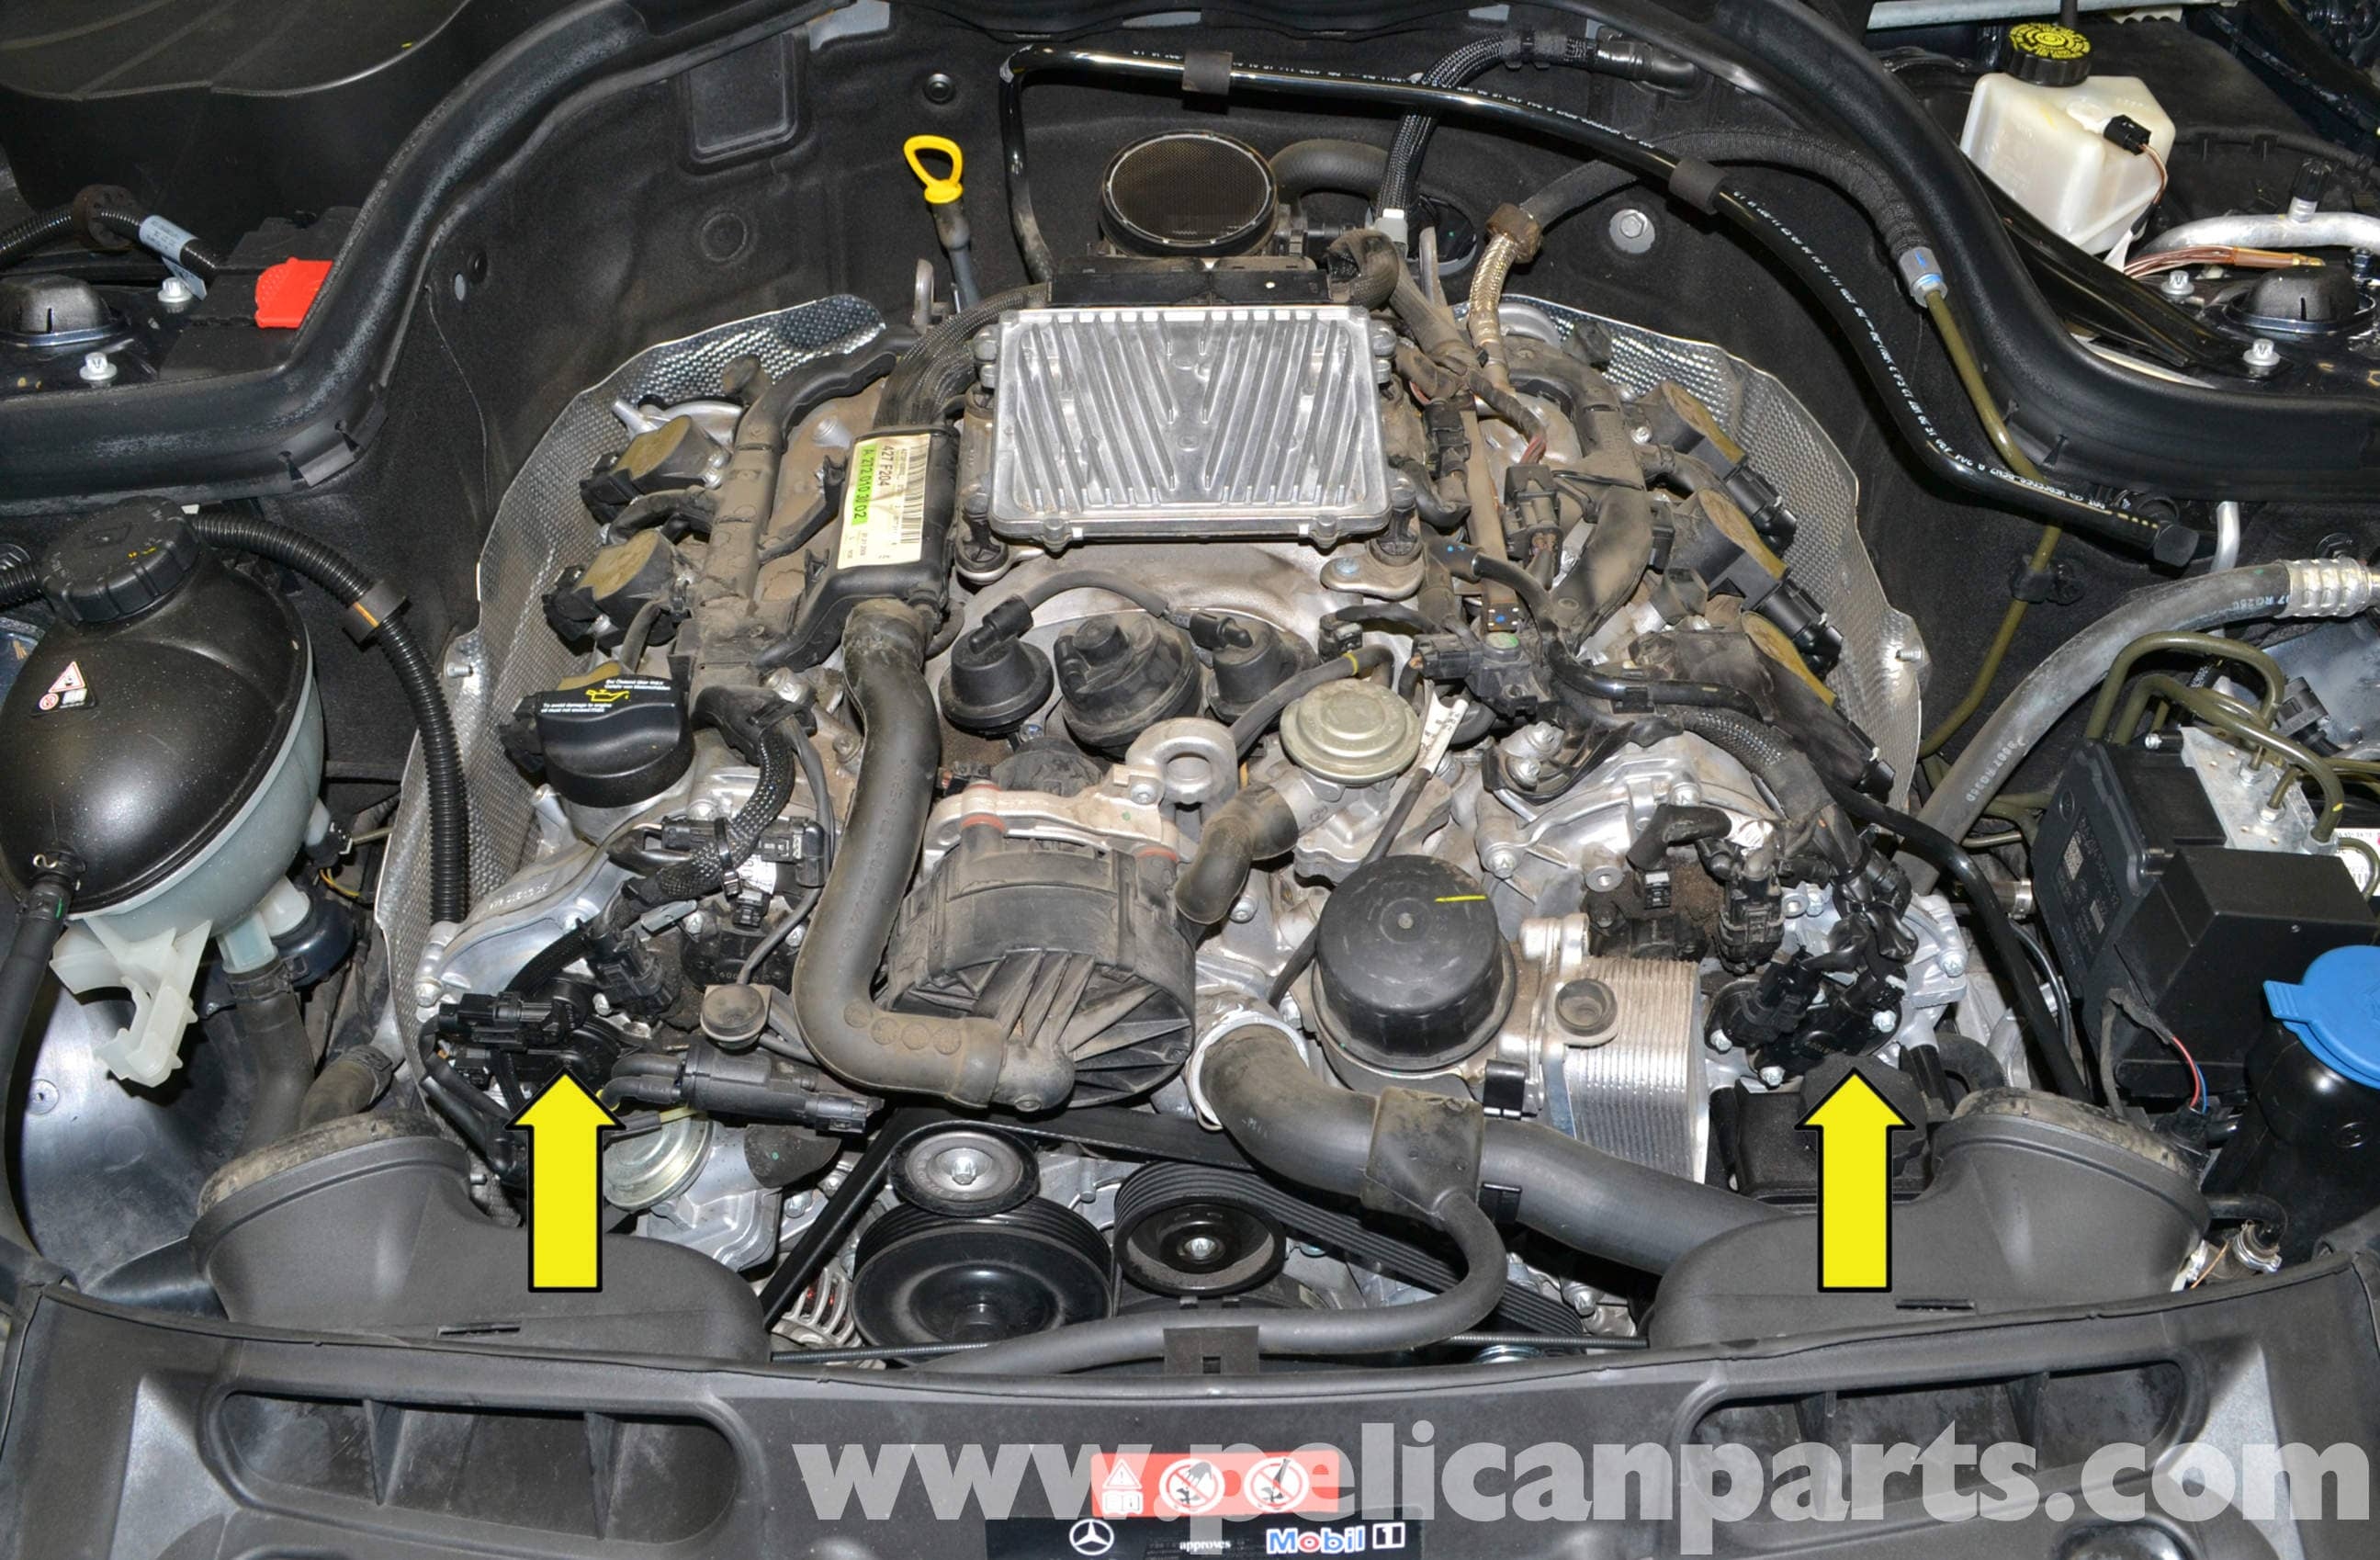 Mercedes Benz W204 Camshaft Magnetic Adjuster Replacement 2008 2jz Vvt I Engine Wiring Diagram Large Image Extra